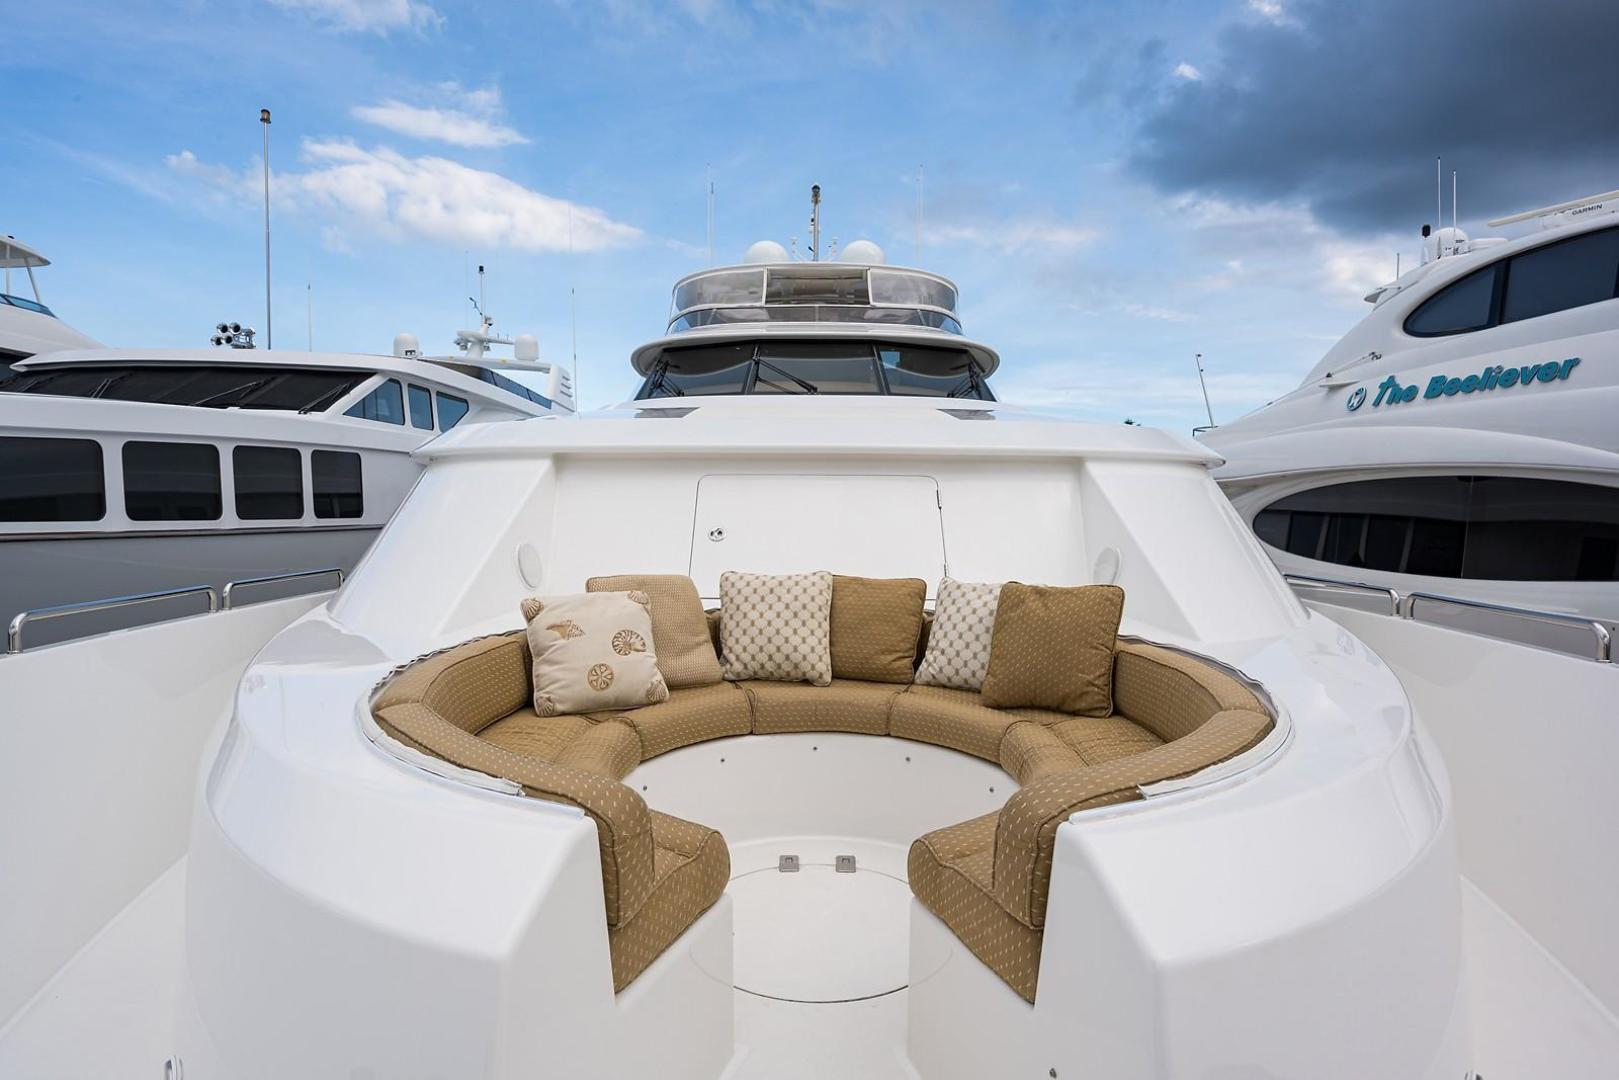 Westport-Motoryacht 2010-Cavallino Fort Lauderdale-Florida-United States-Bow/Keyhole Seating-1270111 | Thumbnail